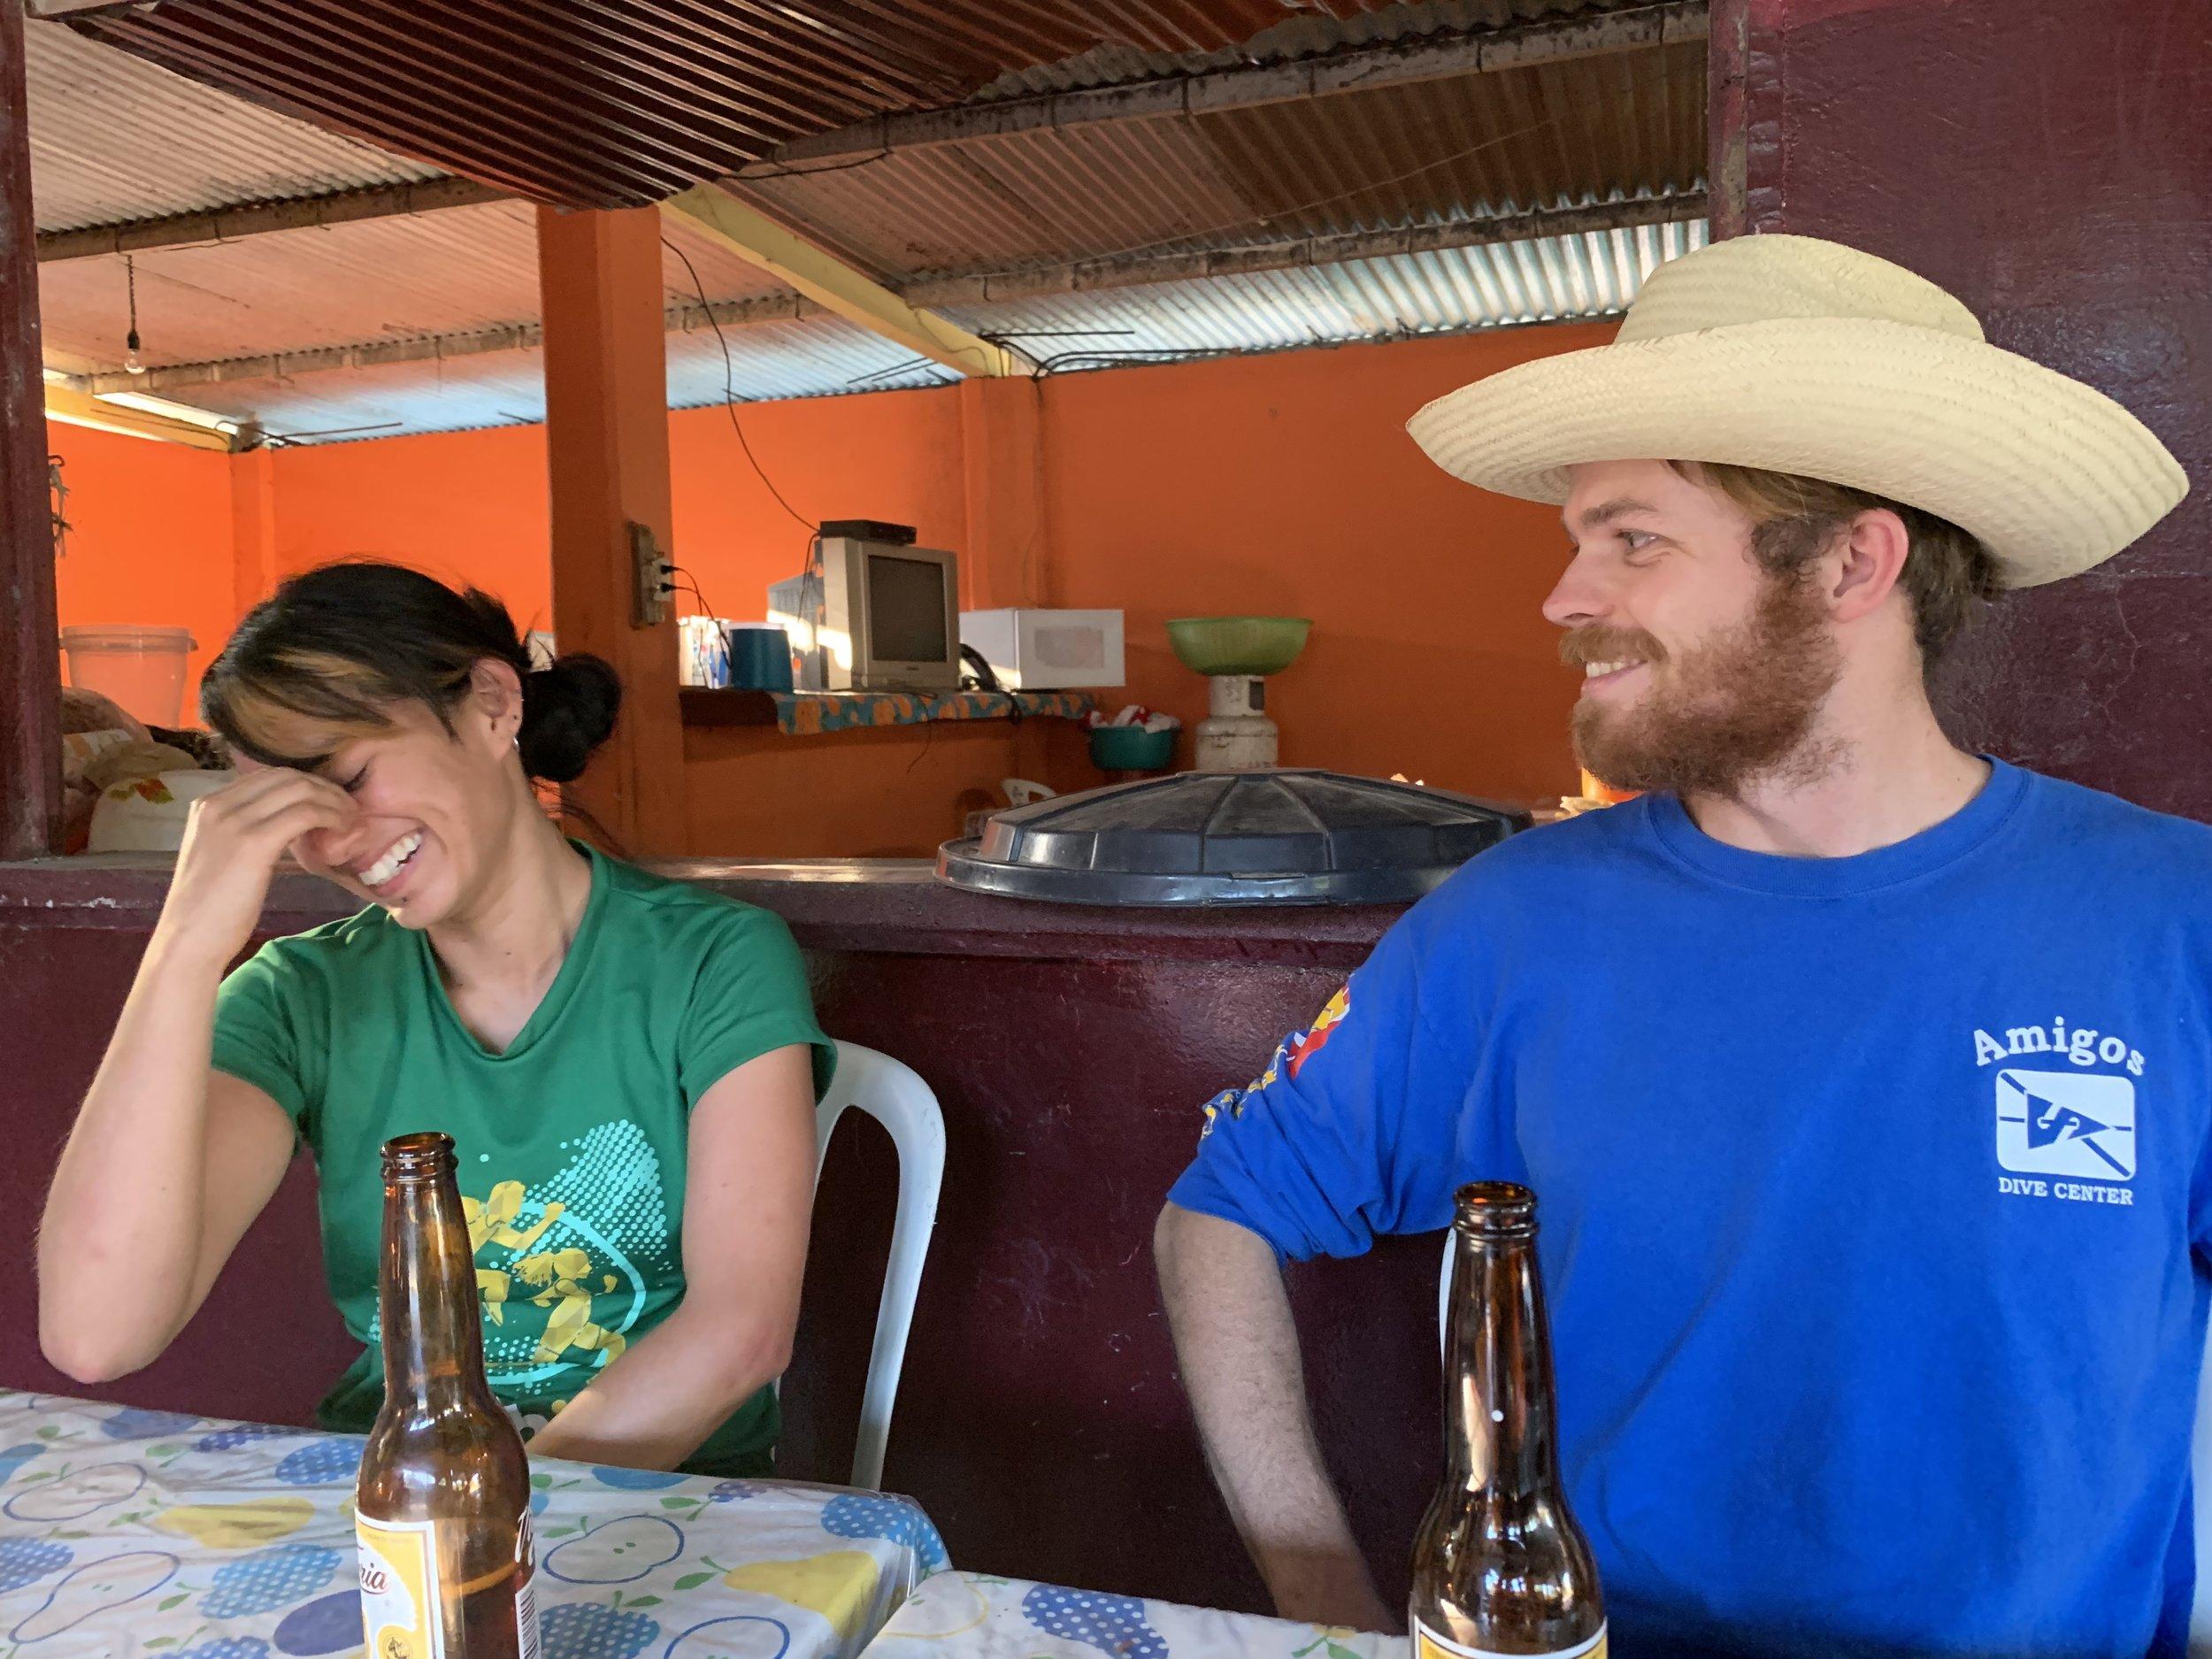 Alejandra Mendoza enjoying Steve Lambert's entertainment. Photo by Teddy Garlock.